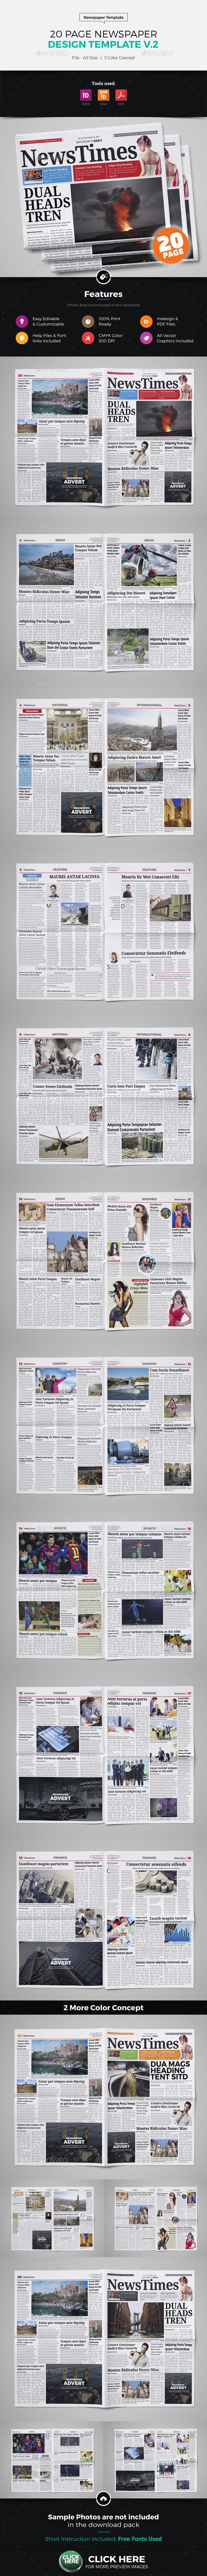 20 Page Newspaper Design v2 - Newsletters Print Templates